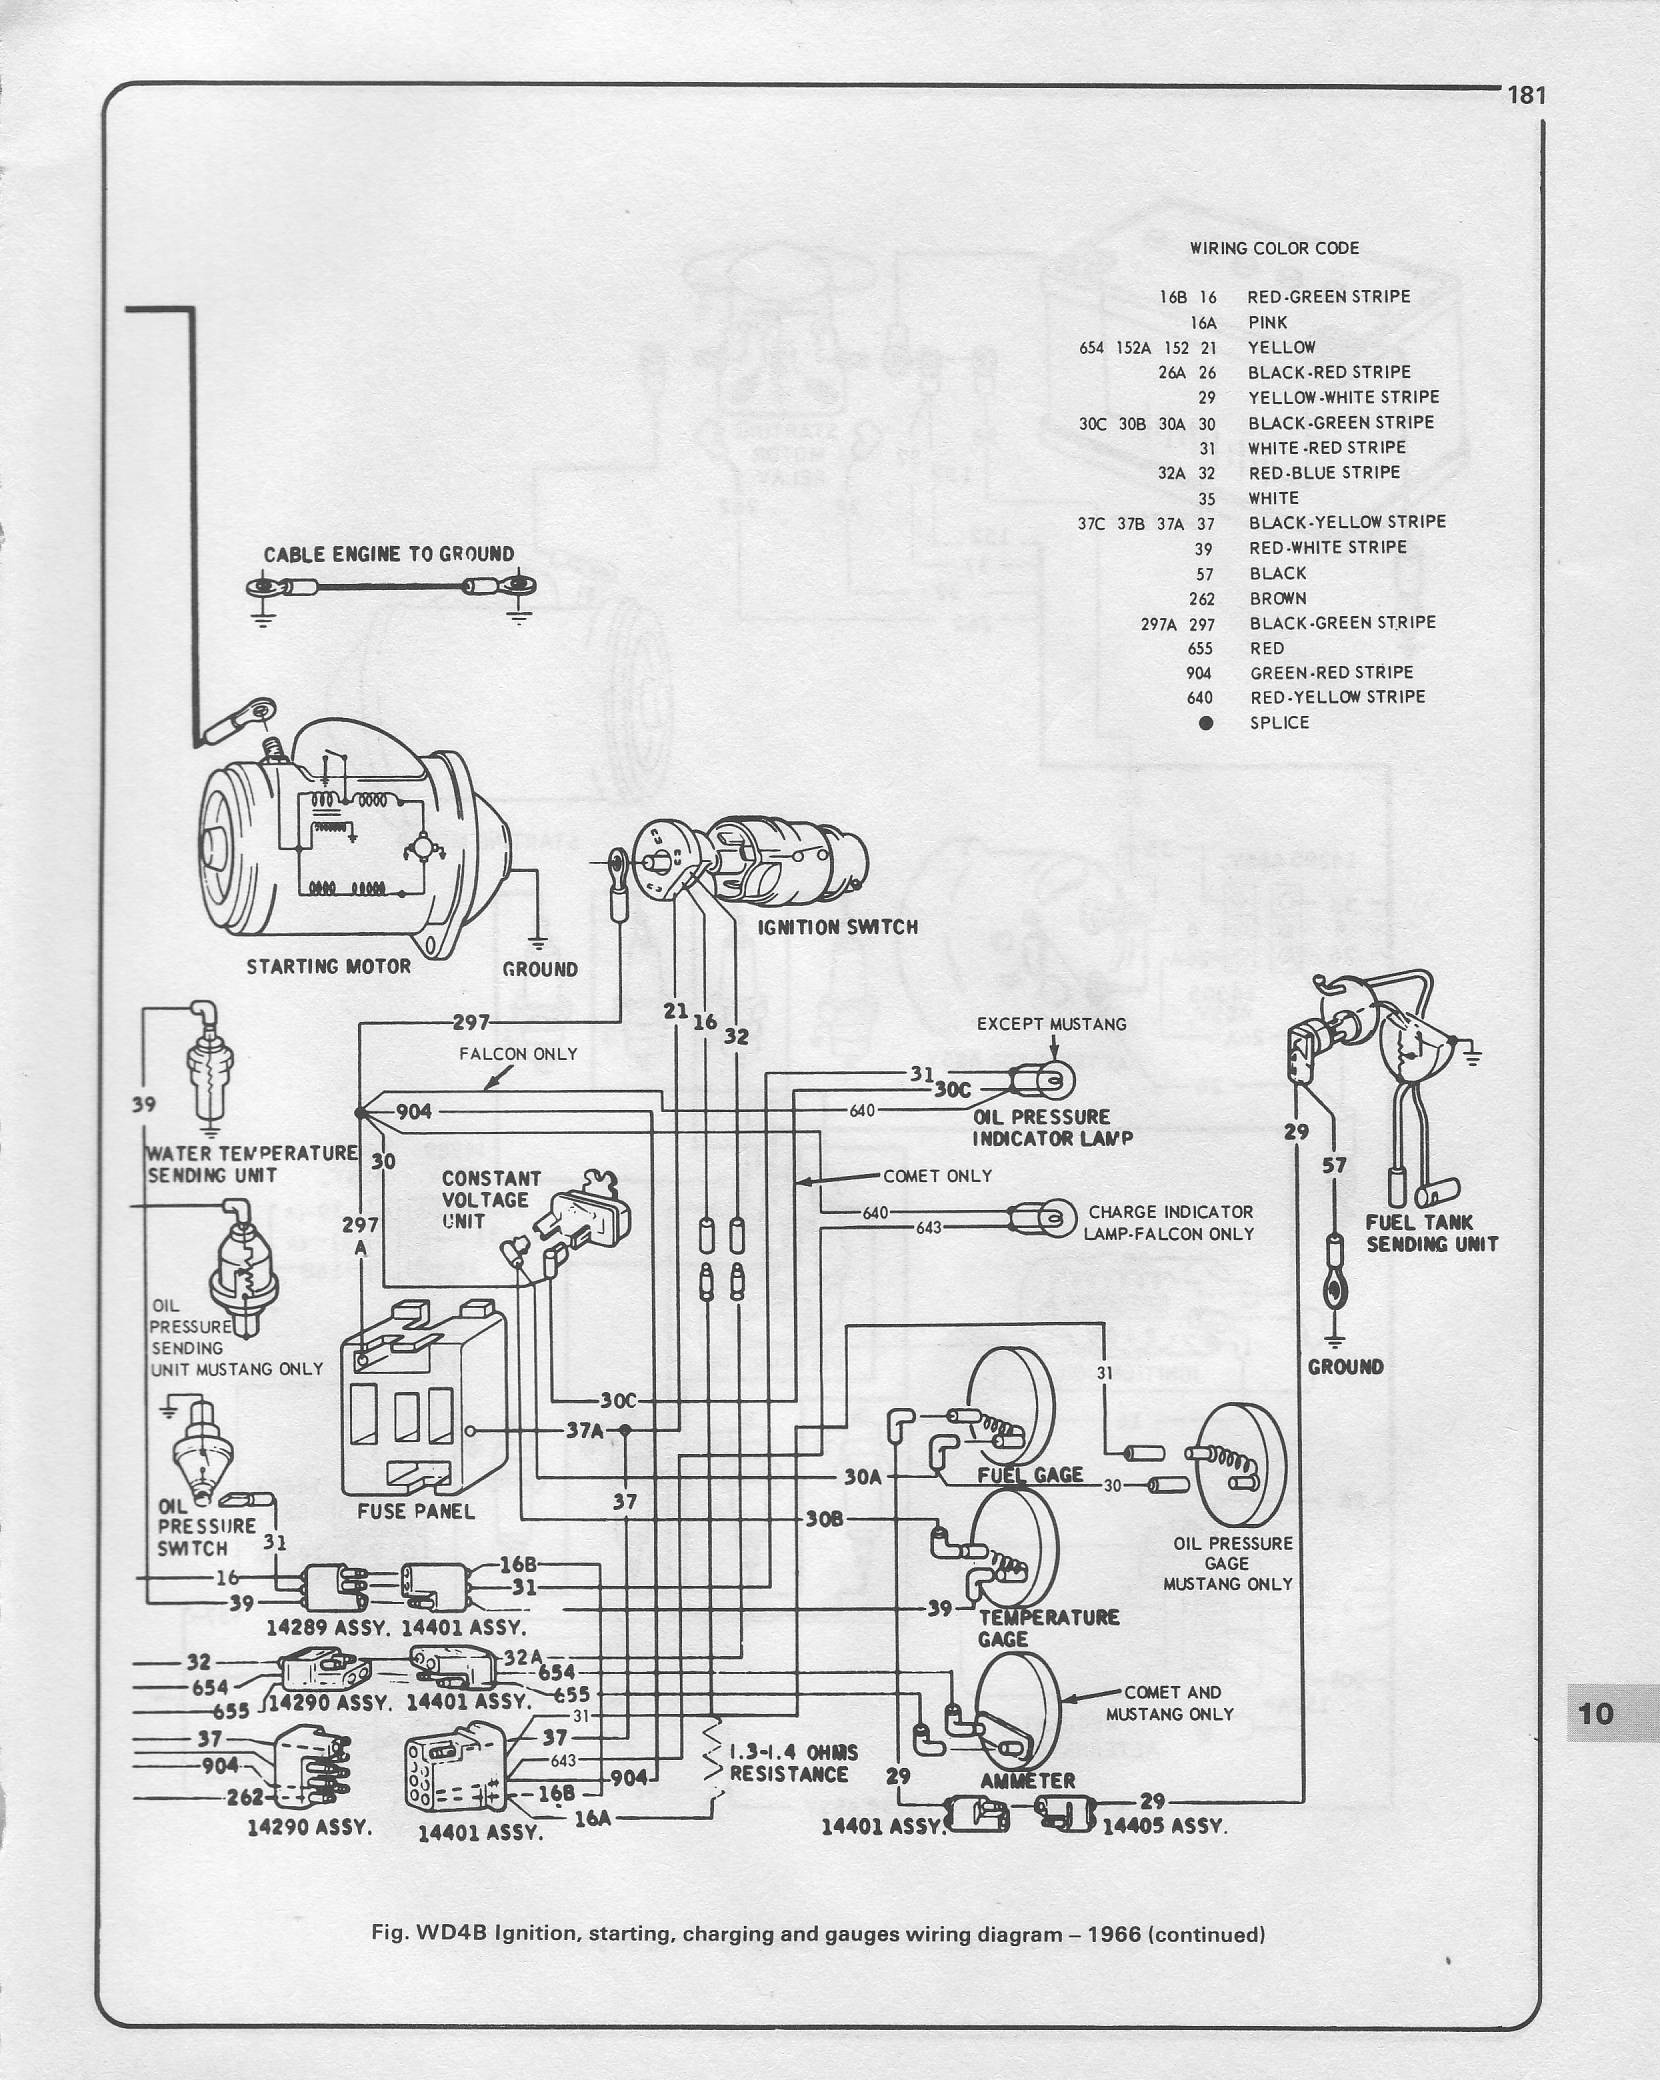 GX_9902] 1968 Mustang 289 Vacuum Diagram Http Wwwallfordmustangscom ForumsVulg Xortanet Chim Sapebe Rmine Bocep Mohammedshrine Librar Wiring 101